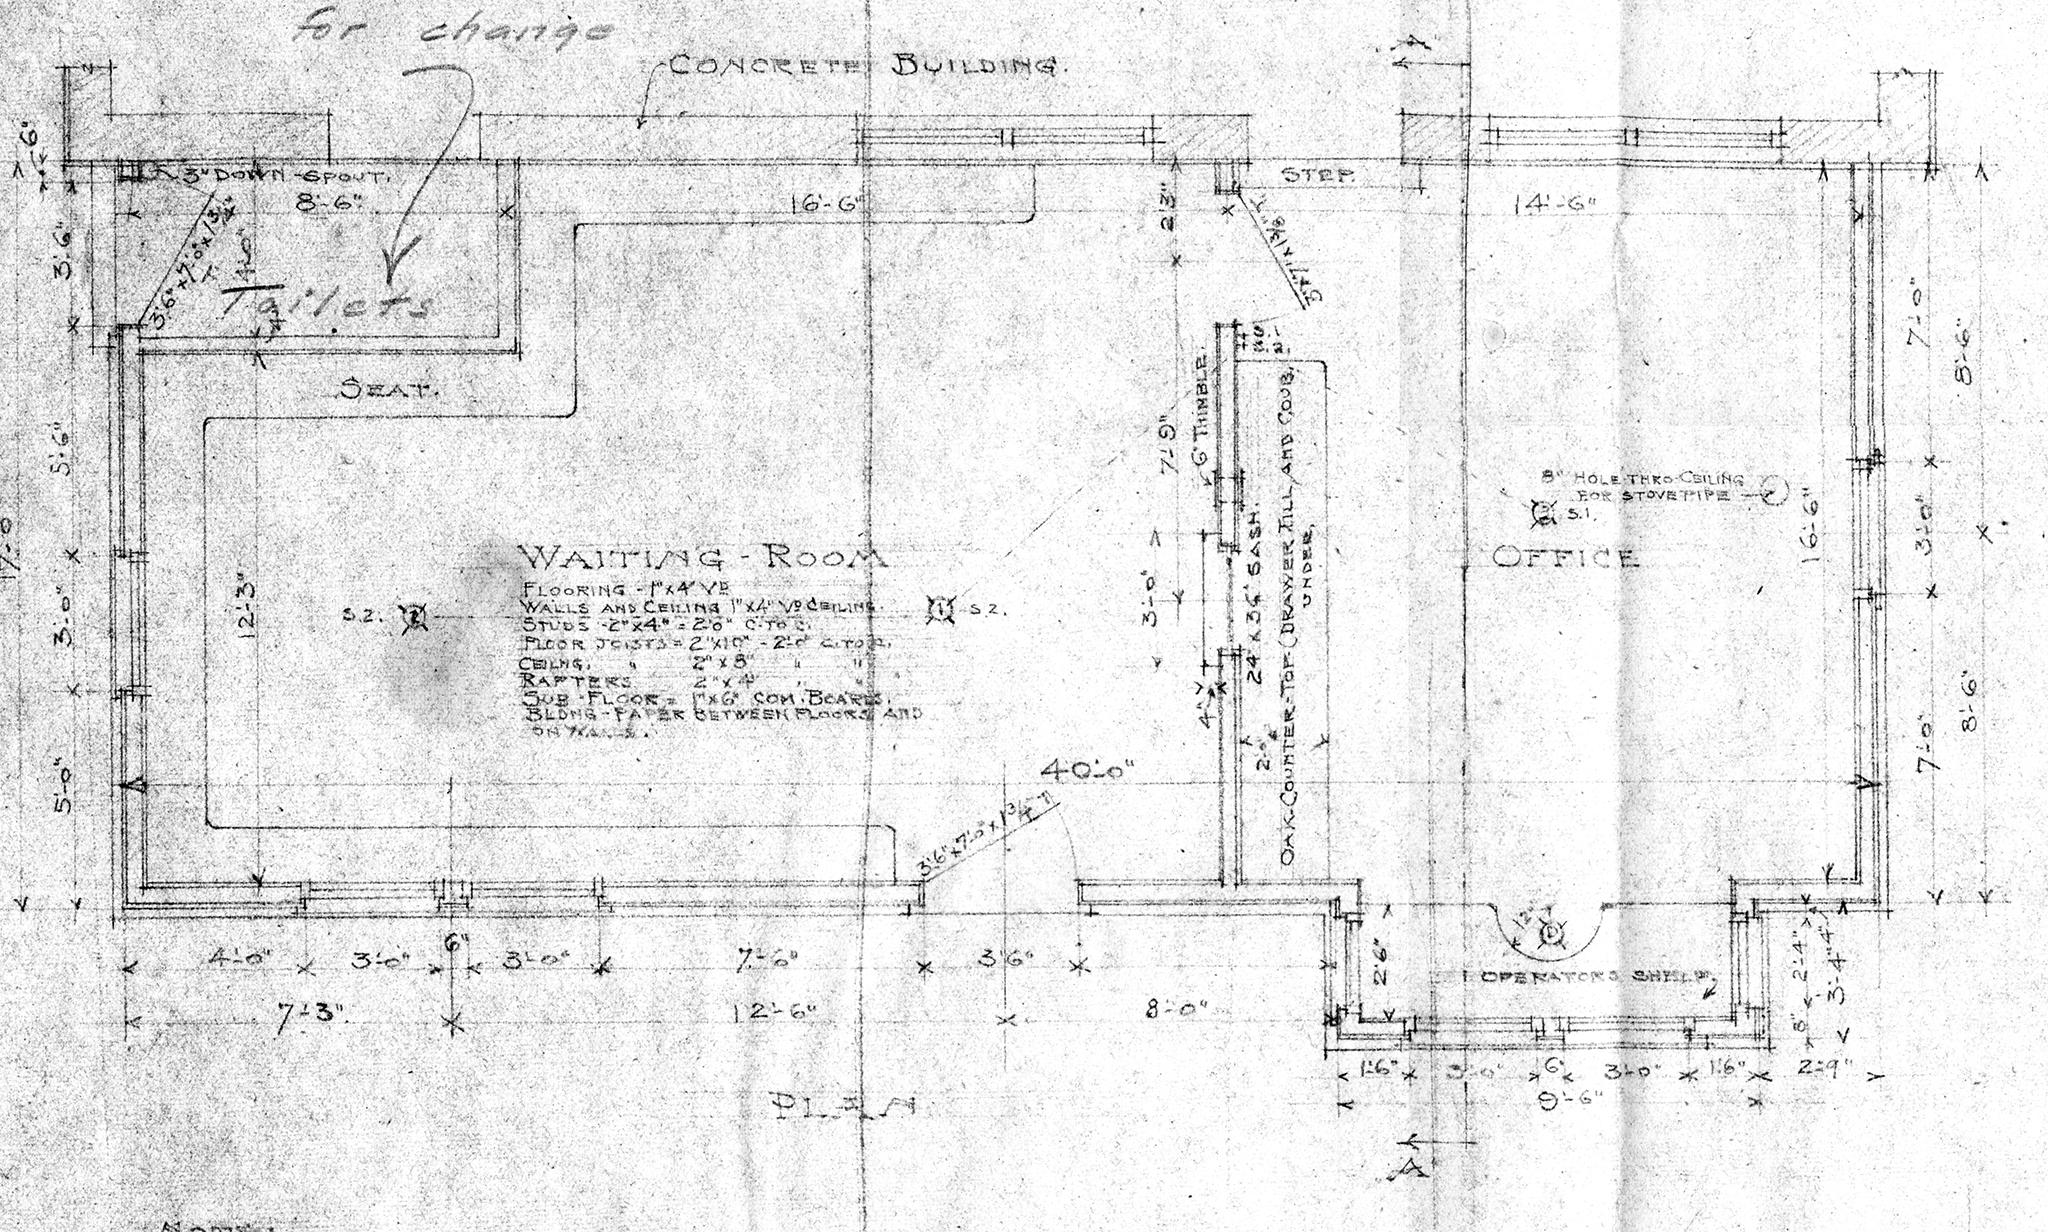 Multnomah Station Blueprint, Floor Plan, ca. 1908. Courtesy Le Meitour Gallery.